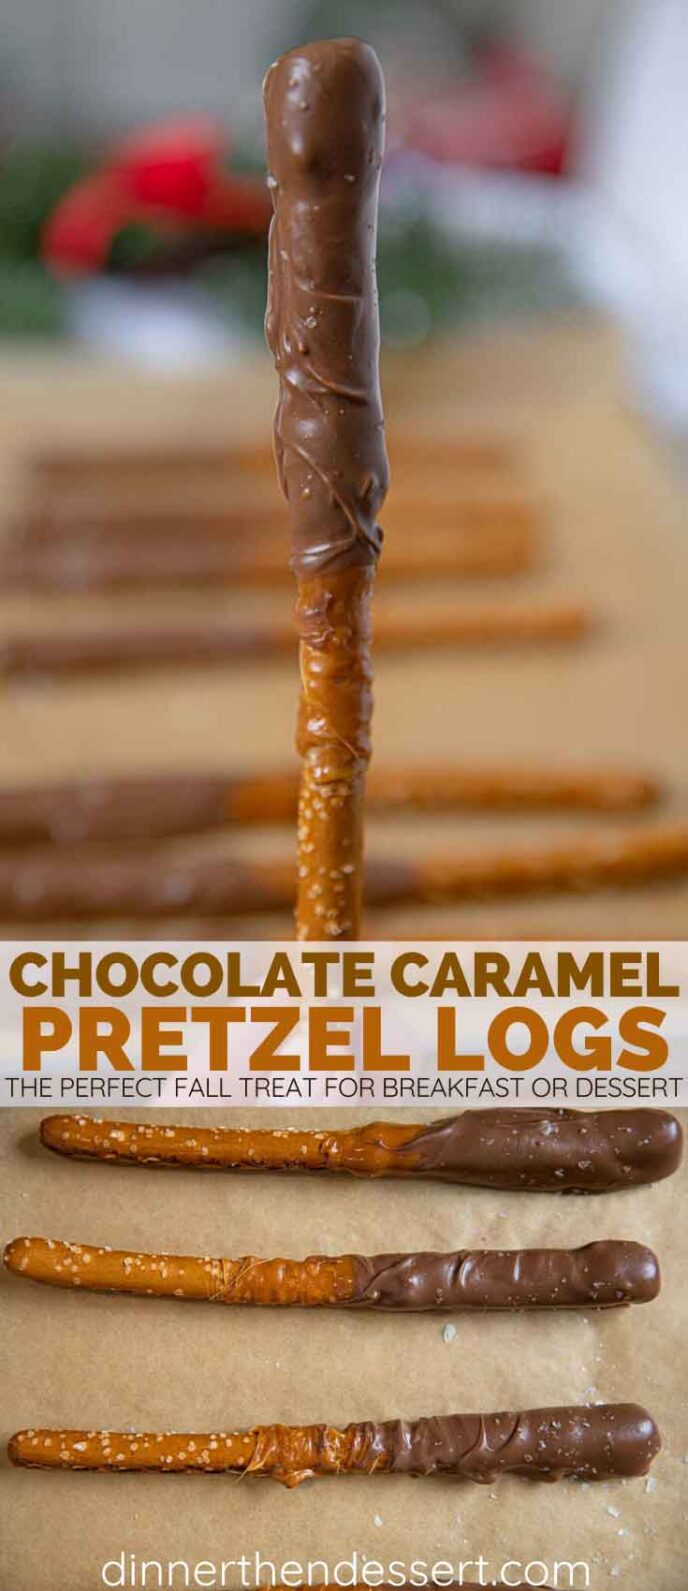 Chocolate Caramel Pretzel Logs collage